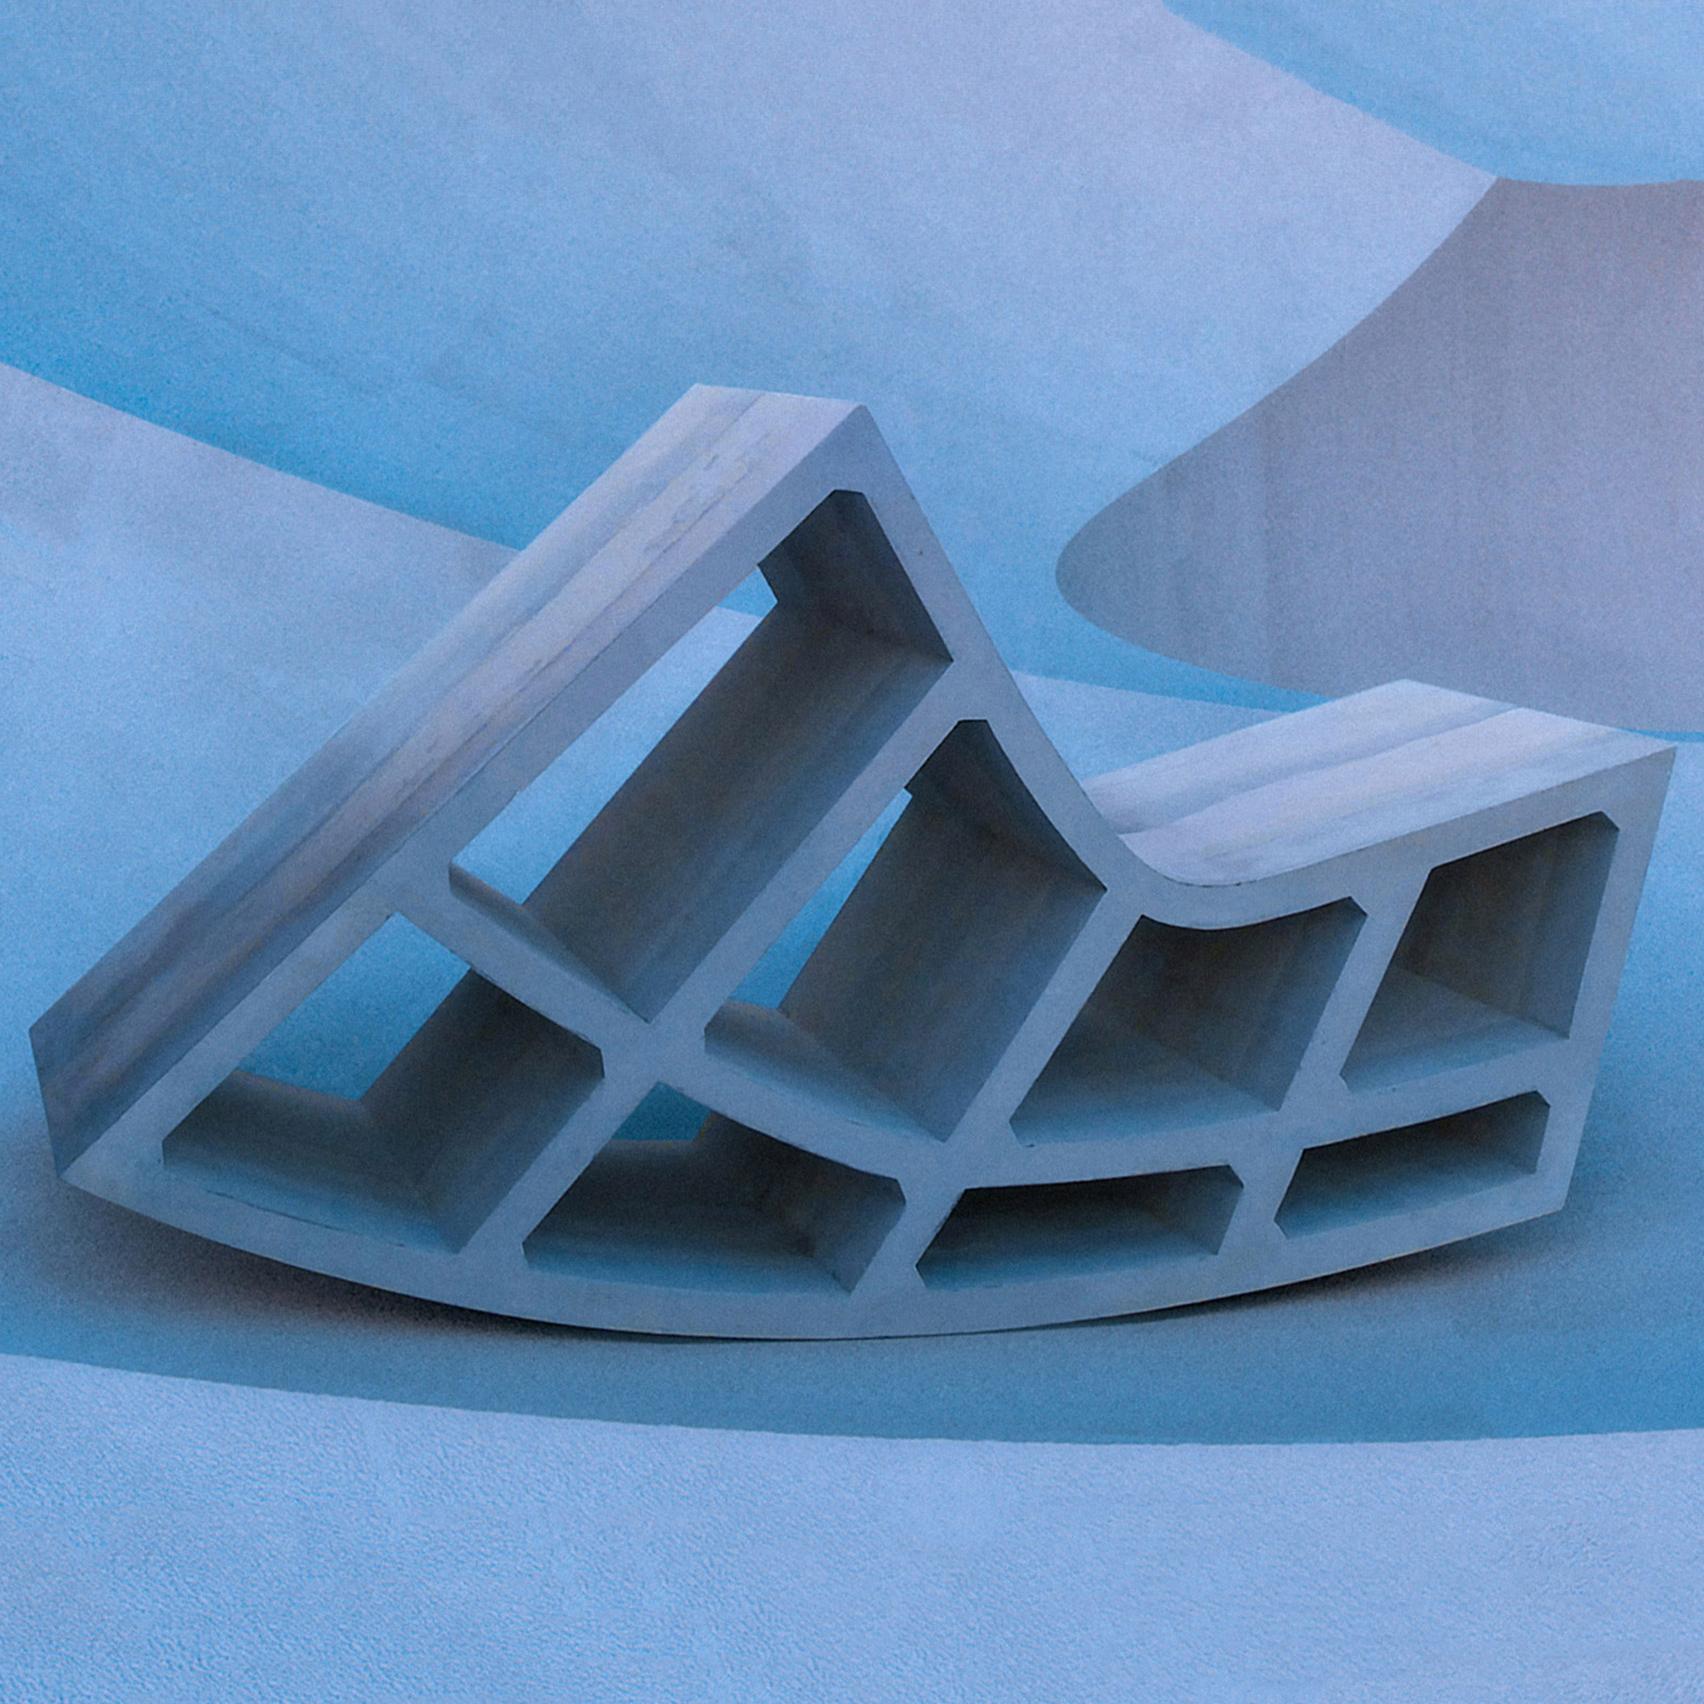 concrete-furniture-cassius-castings-doesnt-come-out-sq-1-2-1